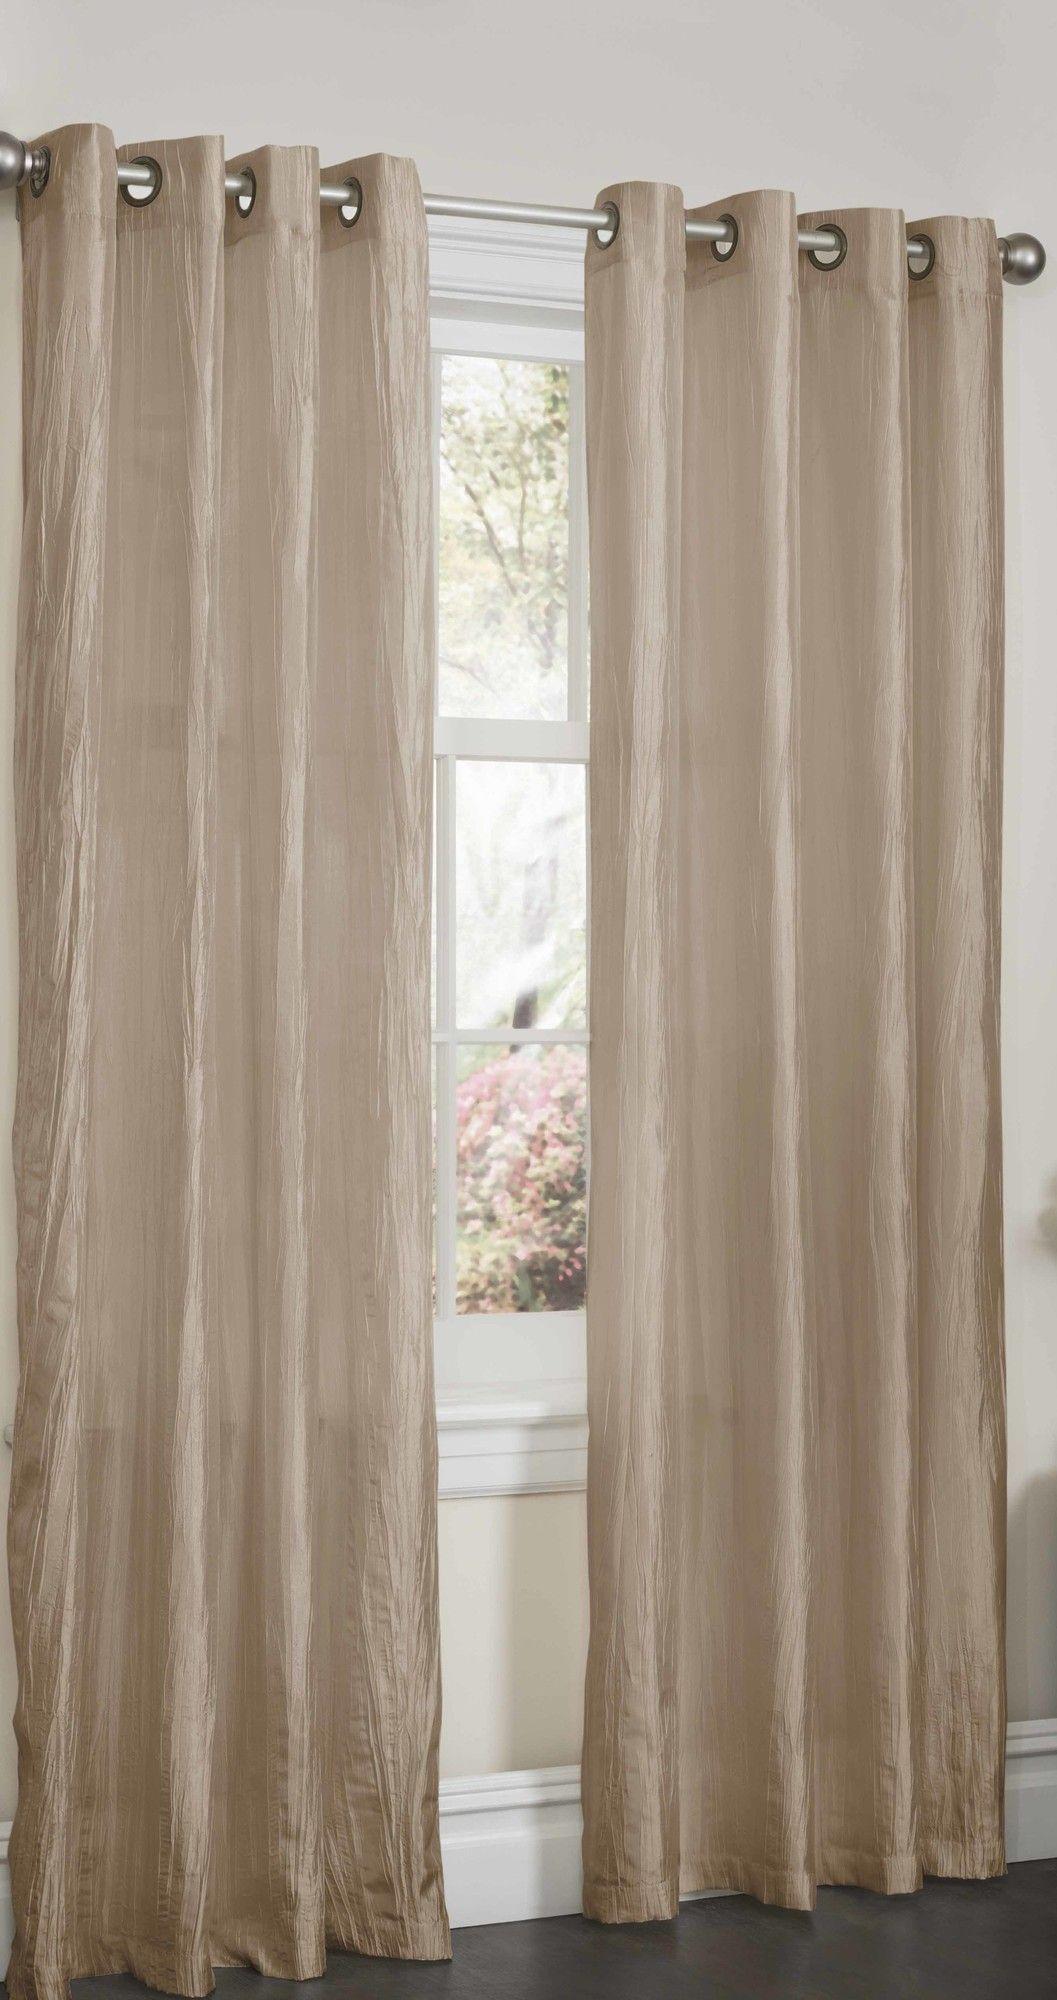 Sherry Crushed Satin Curtain Panel Satin Curtains Curtains